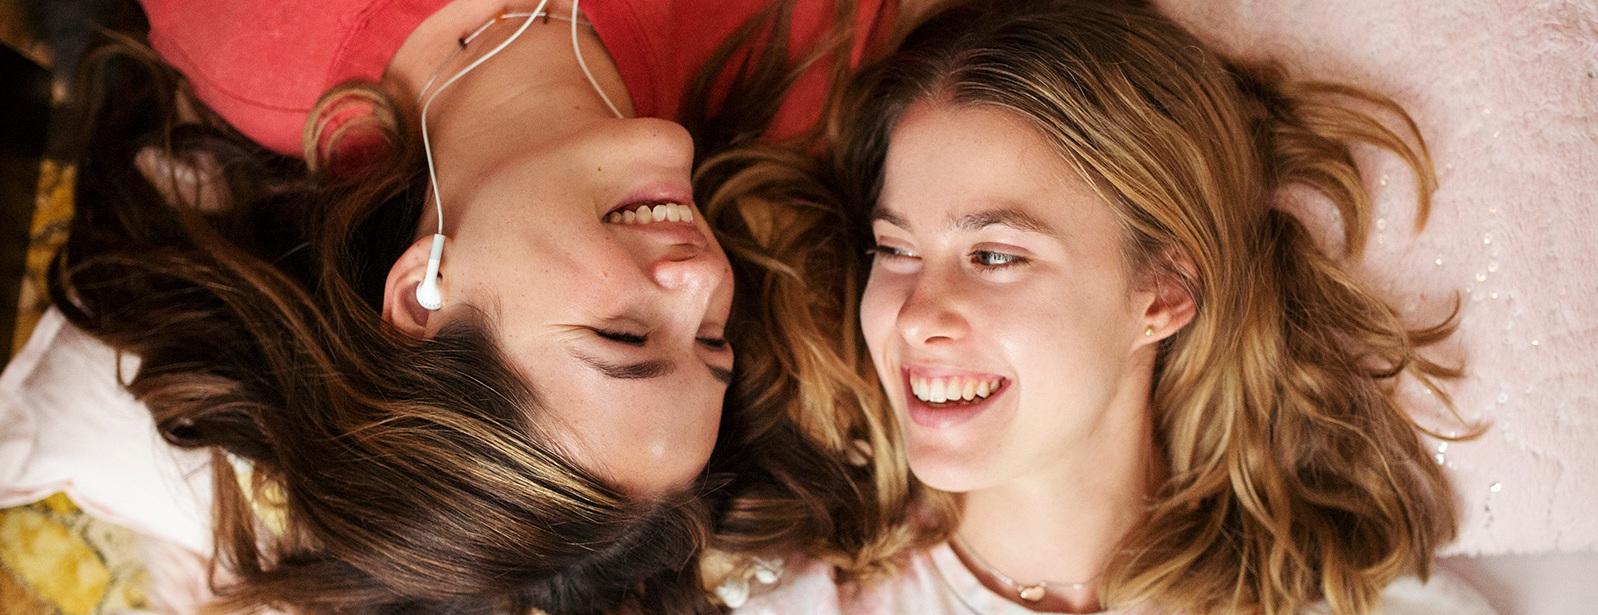 Tracie Savage,Monica Bellucci Italy Hot movies Greta Larkins,Zelda Rubinstein